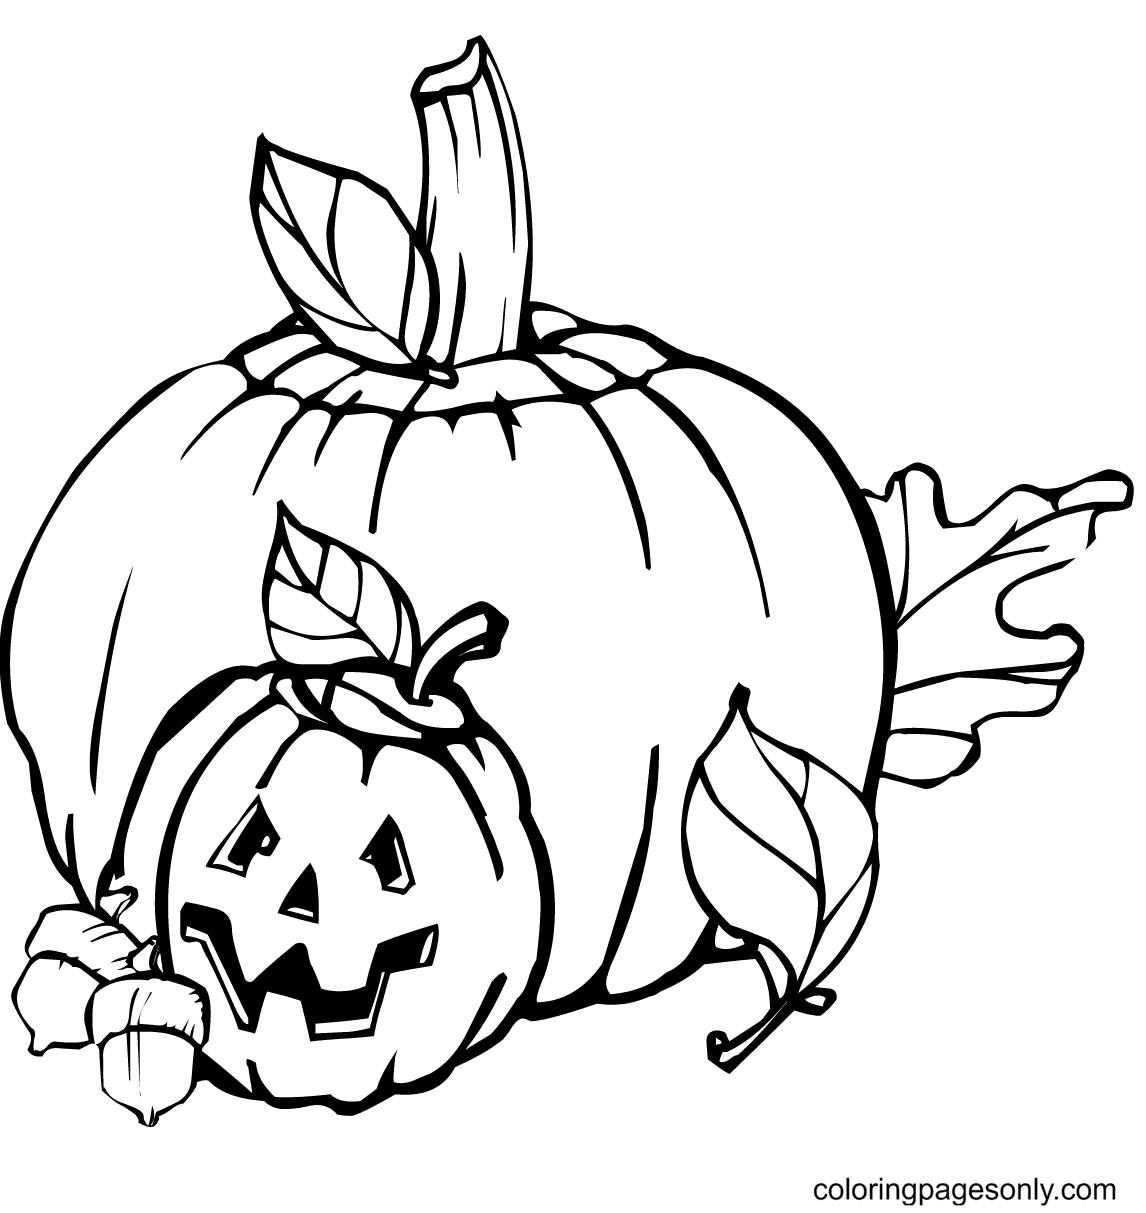 Halloween Decoration Pumpkins Coloring Page